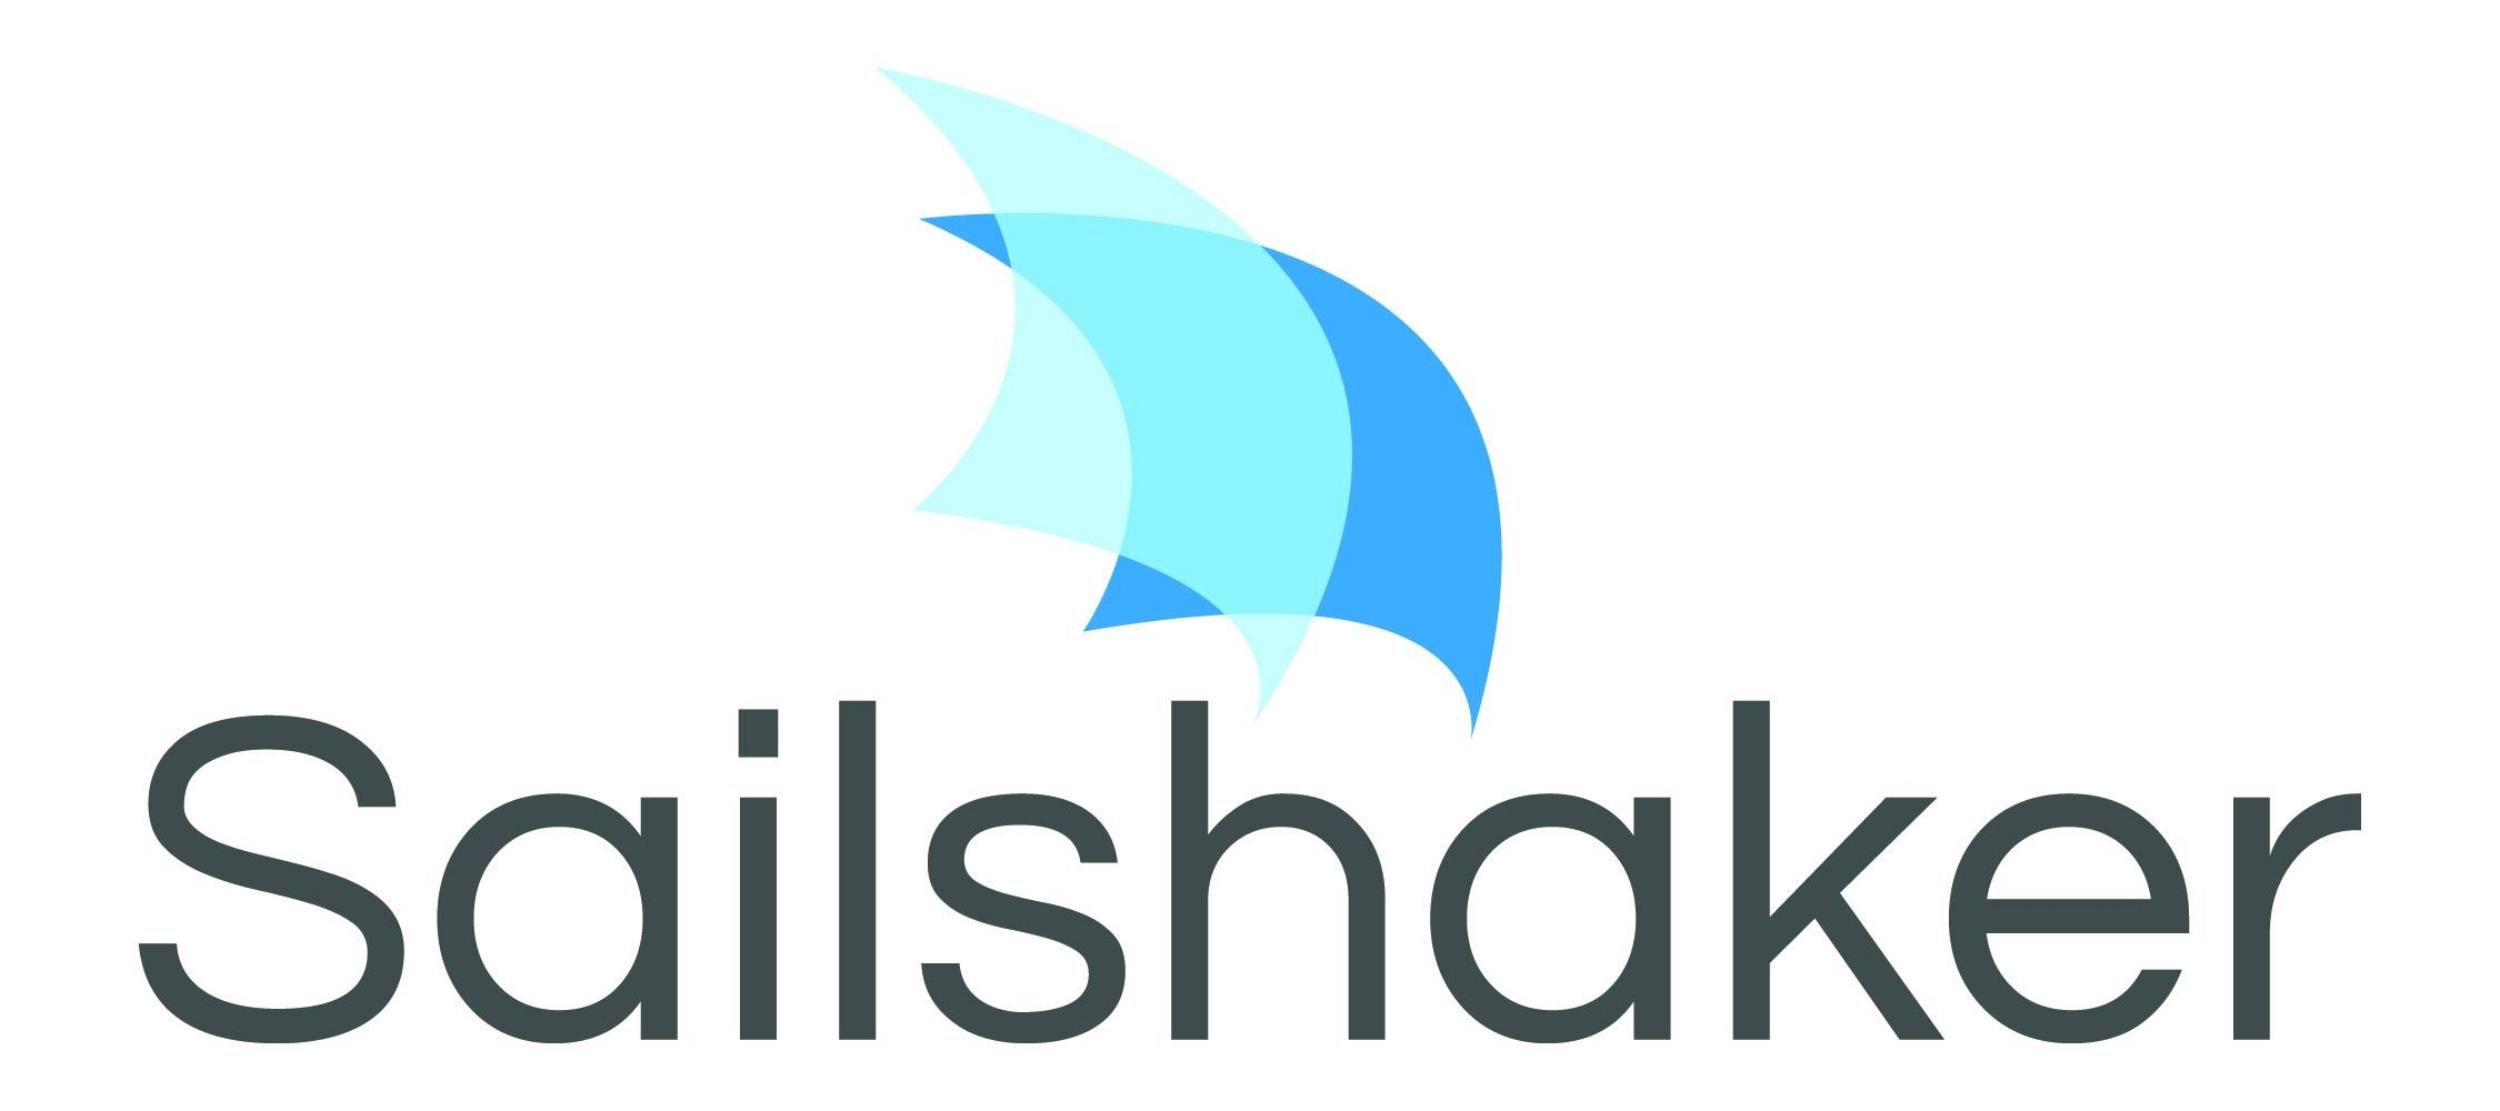 sailshaker_logos_final_300dpi.jpg